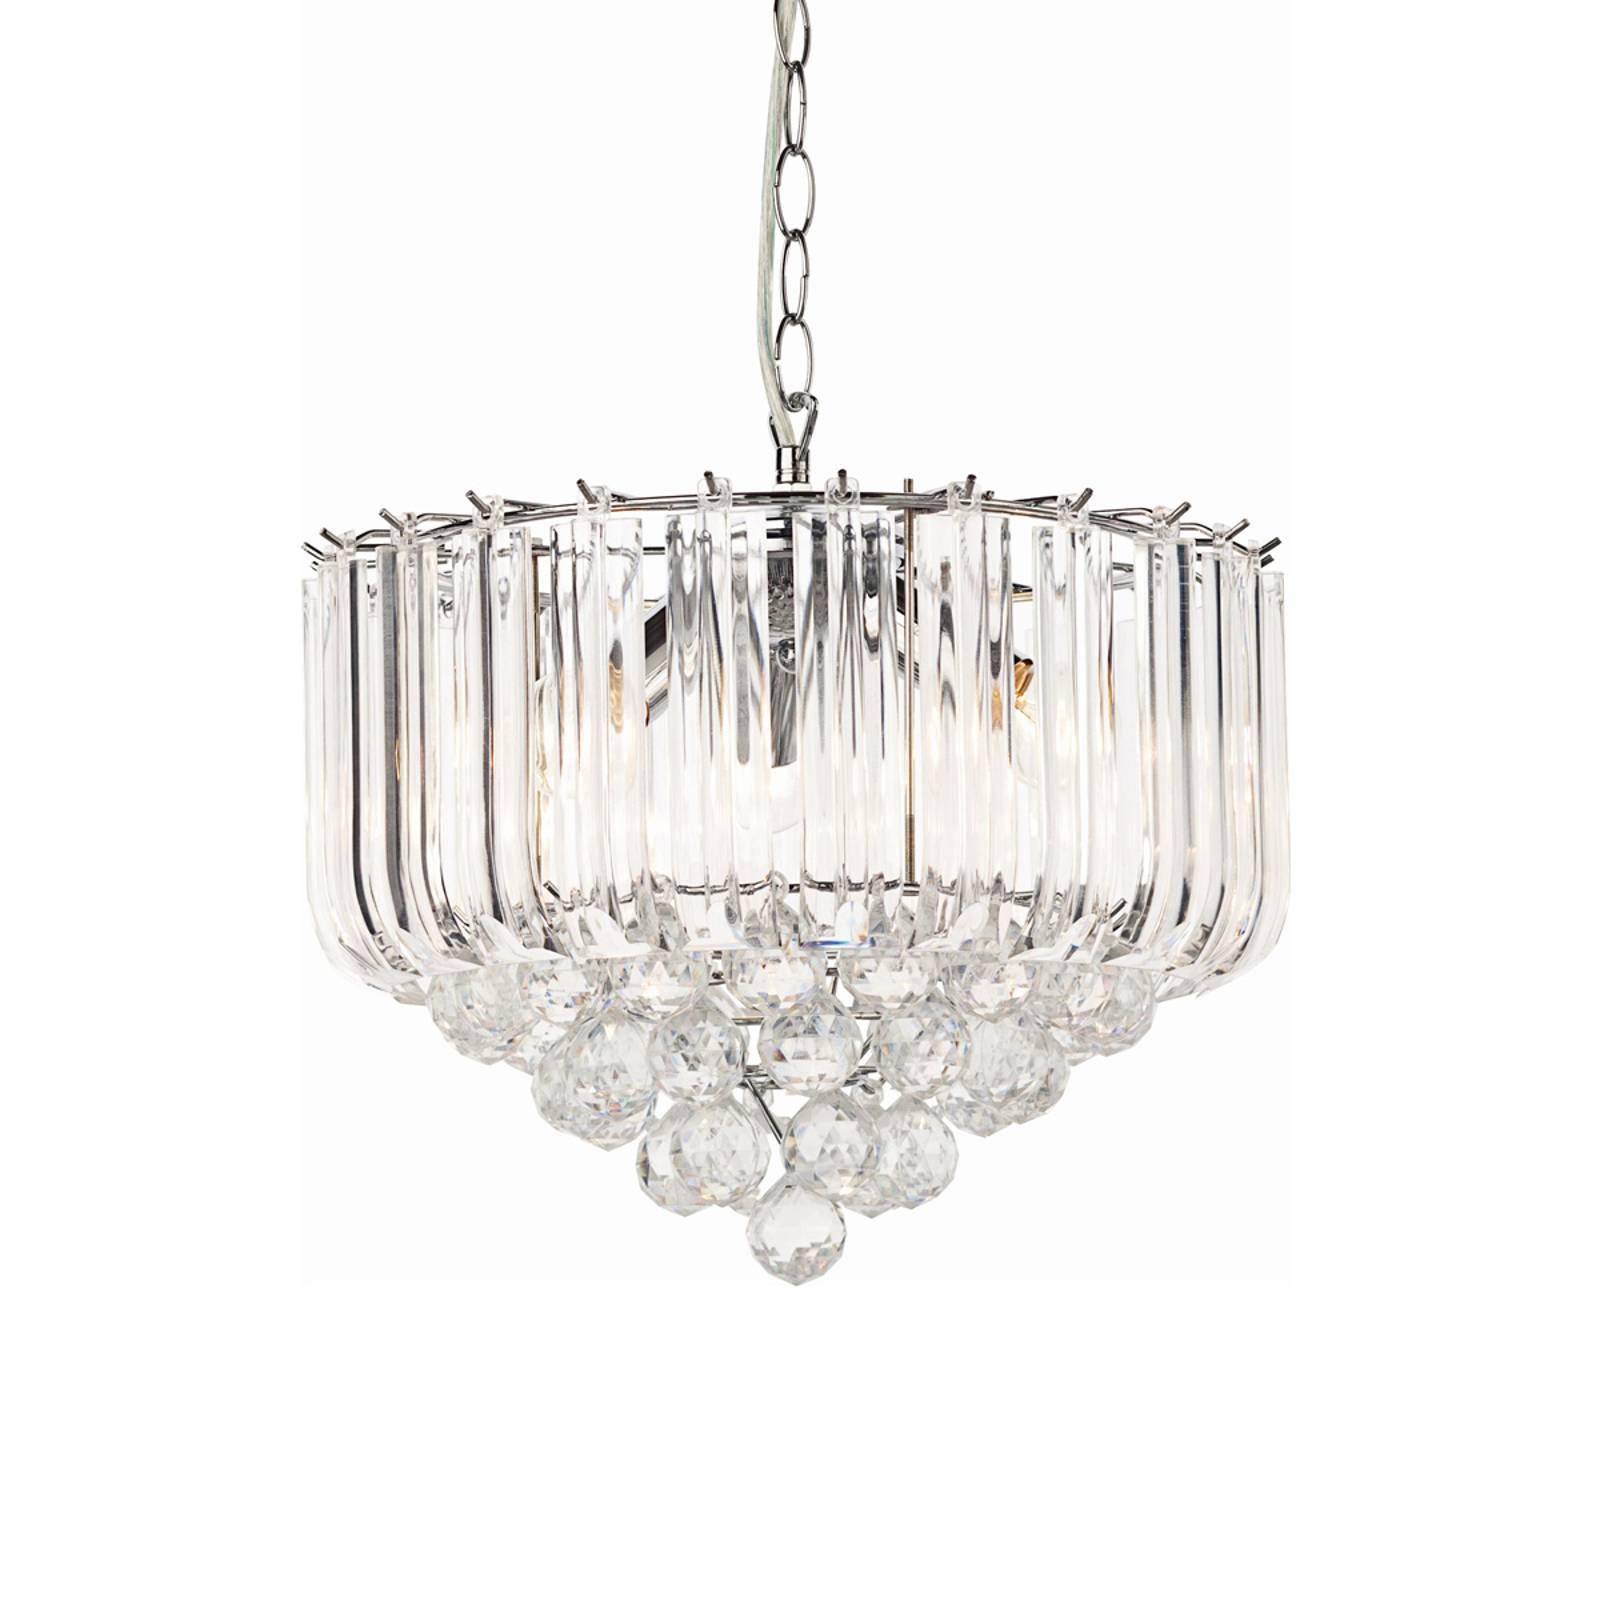 Glinsterende hanglamp Beeke